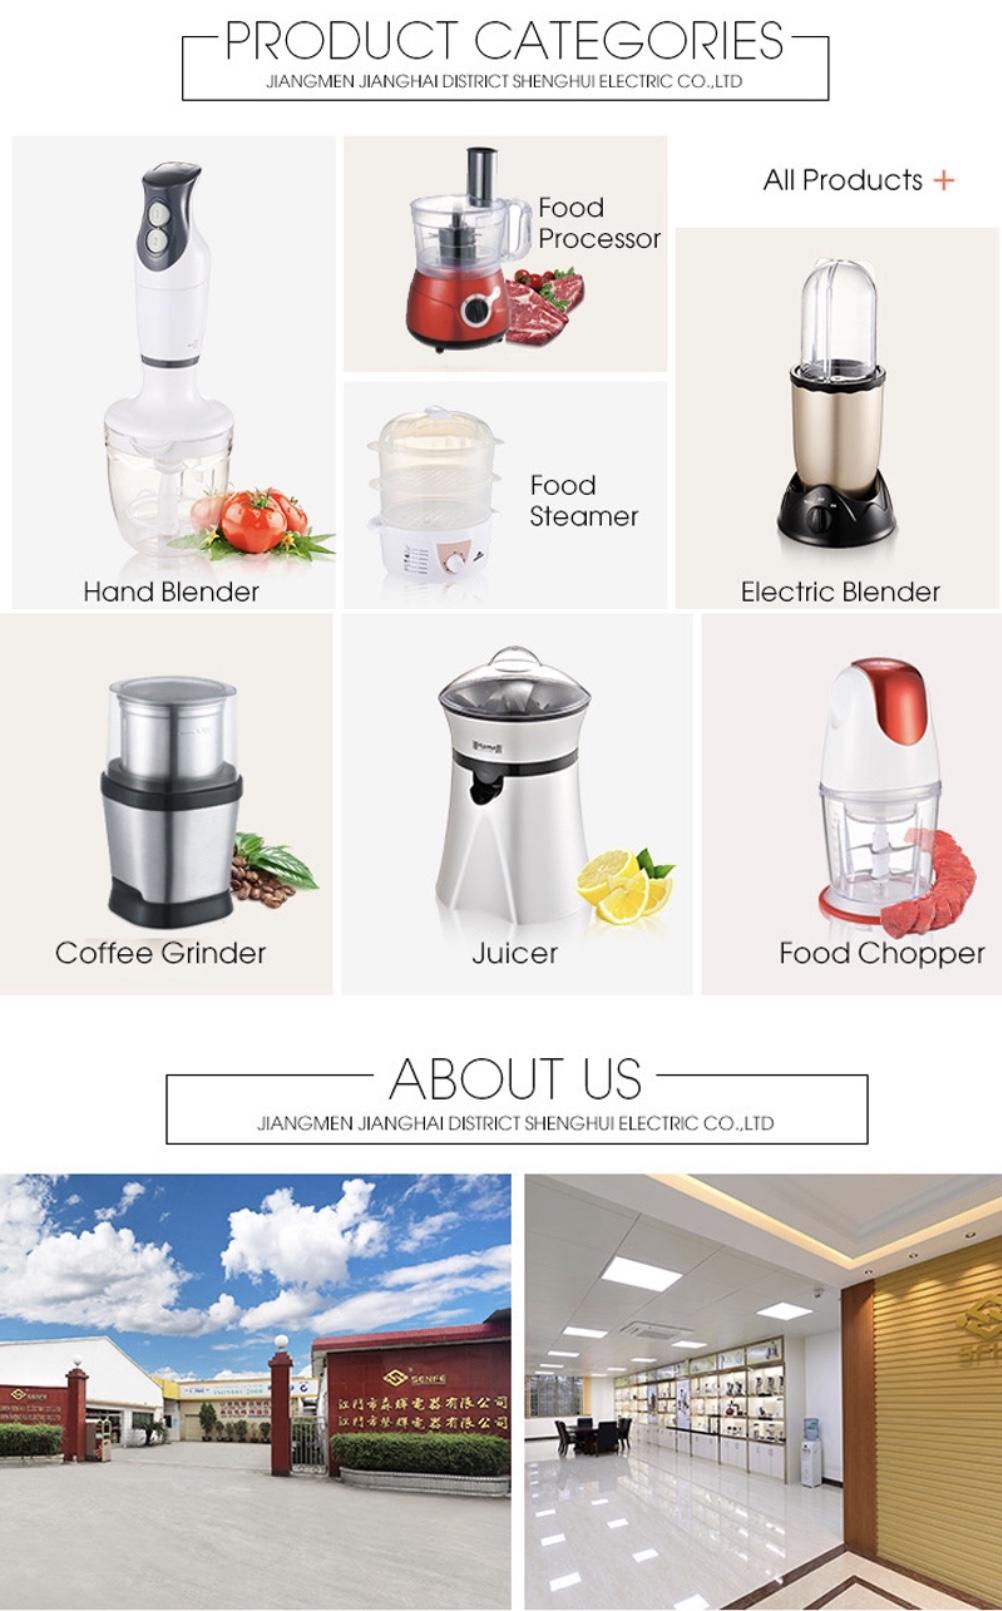 Product Categorise